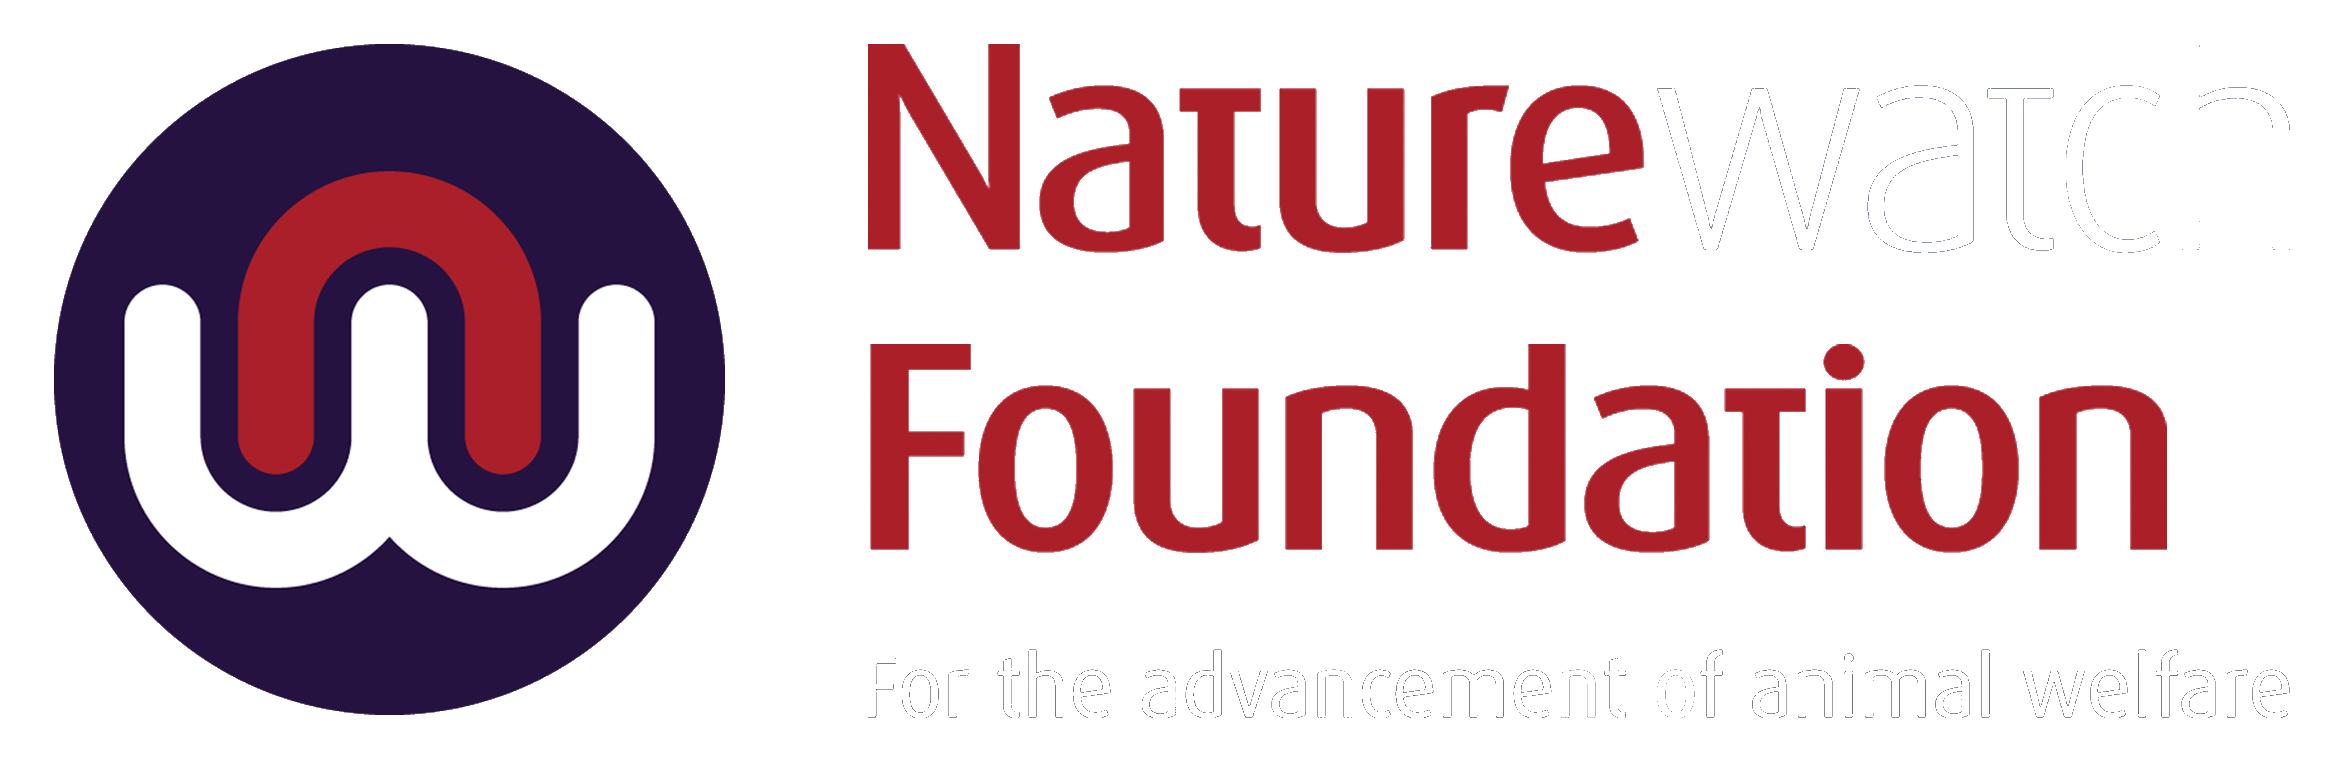 Nature Watch Foundation